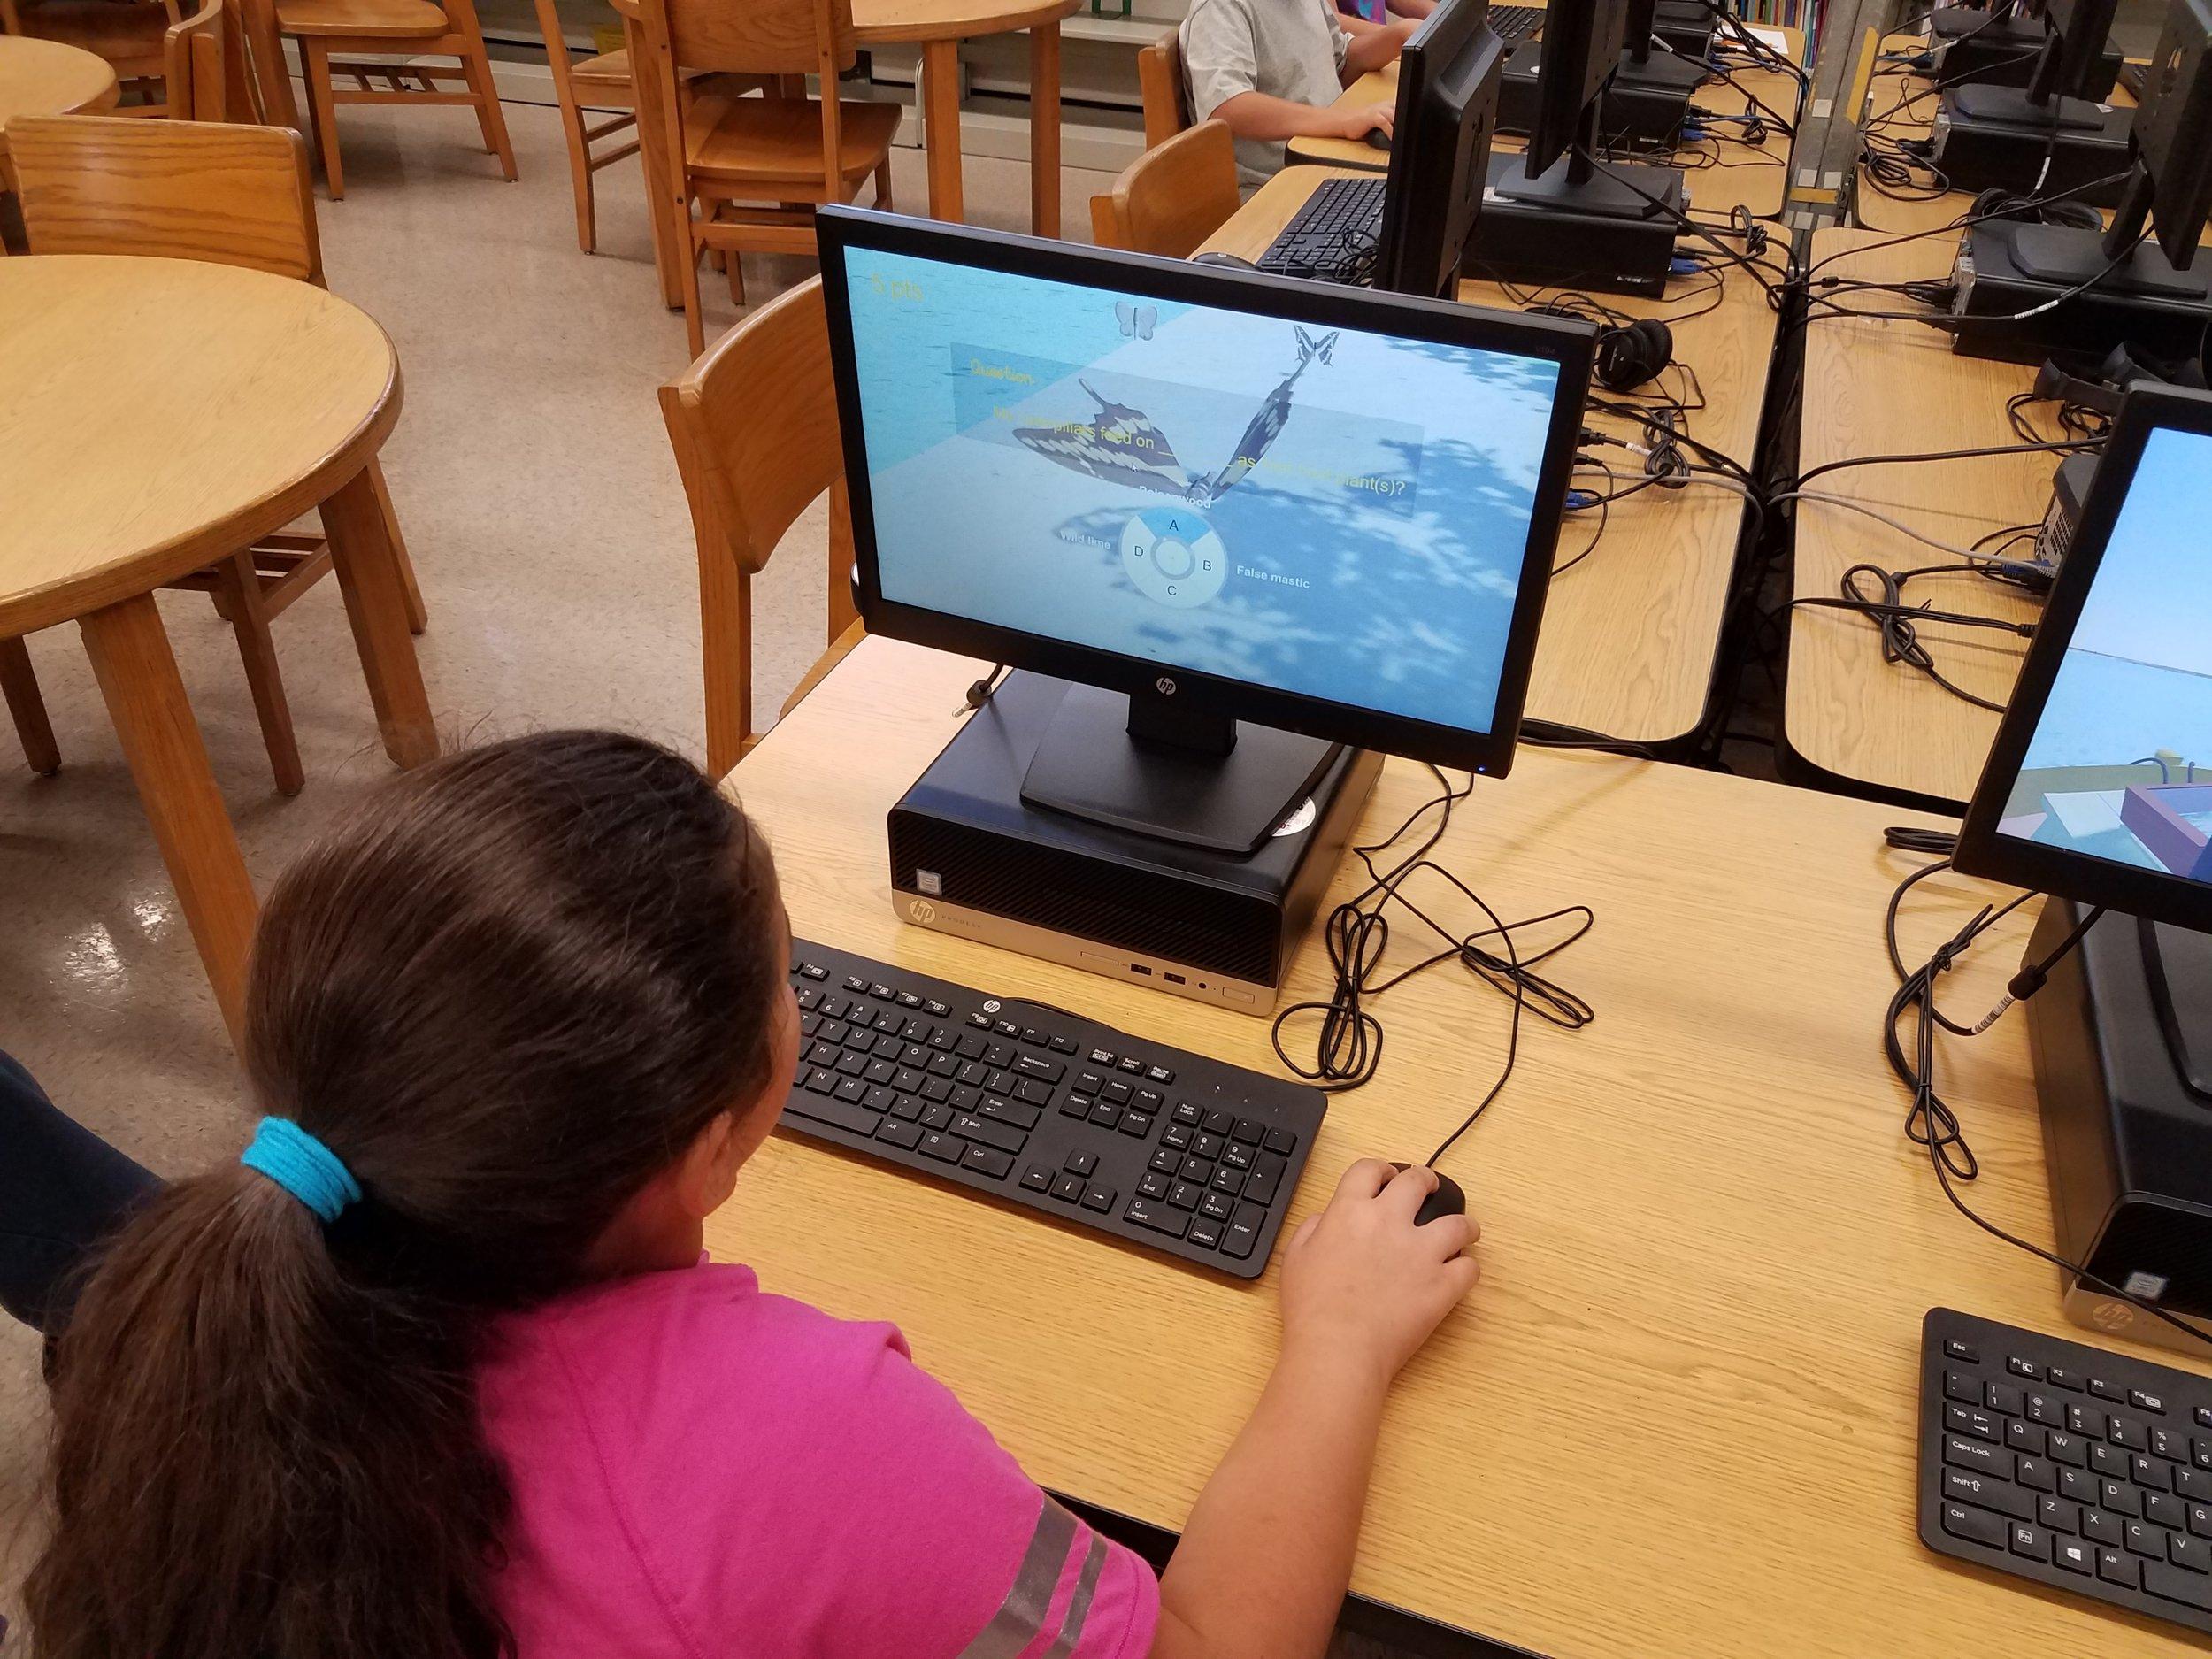 STEM Day - North Hialeah ElementaryButterfly World 1.0: Desktop Version